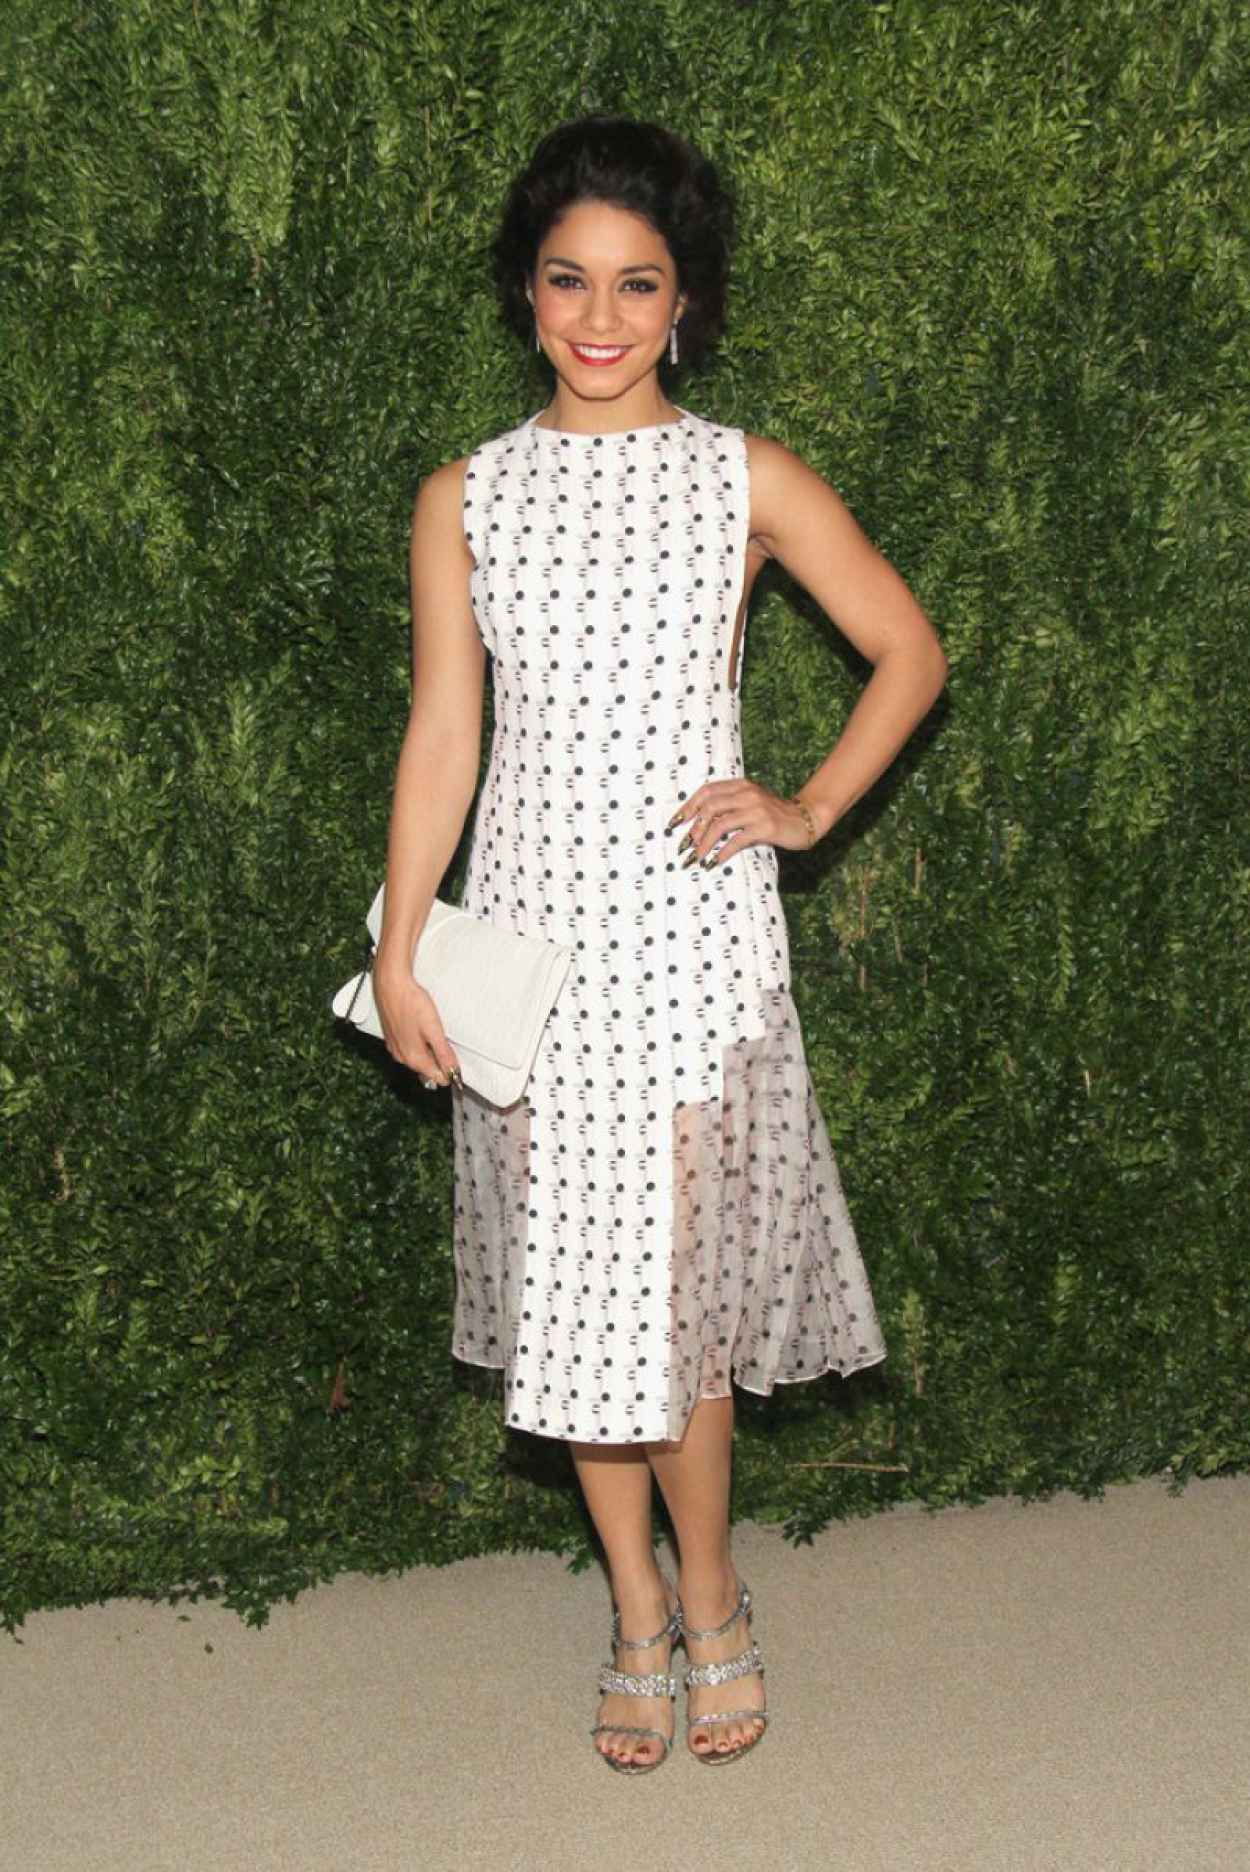 Vanessa Hudgens Attends CFDA & Vogue Fund Reception in New York City-2